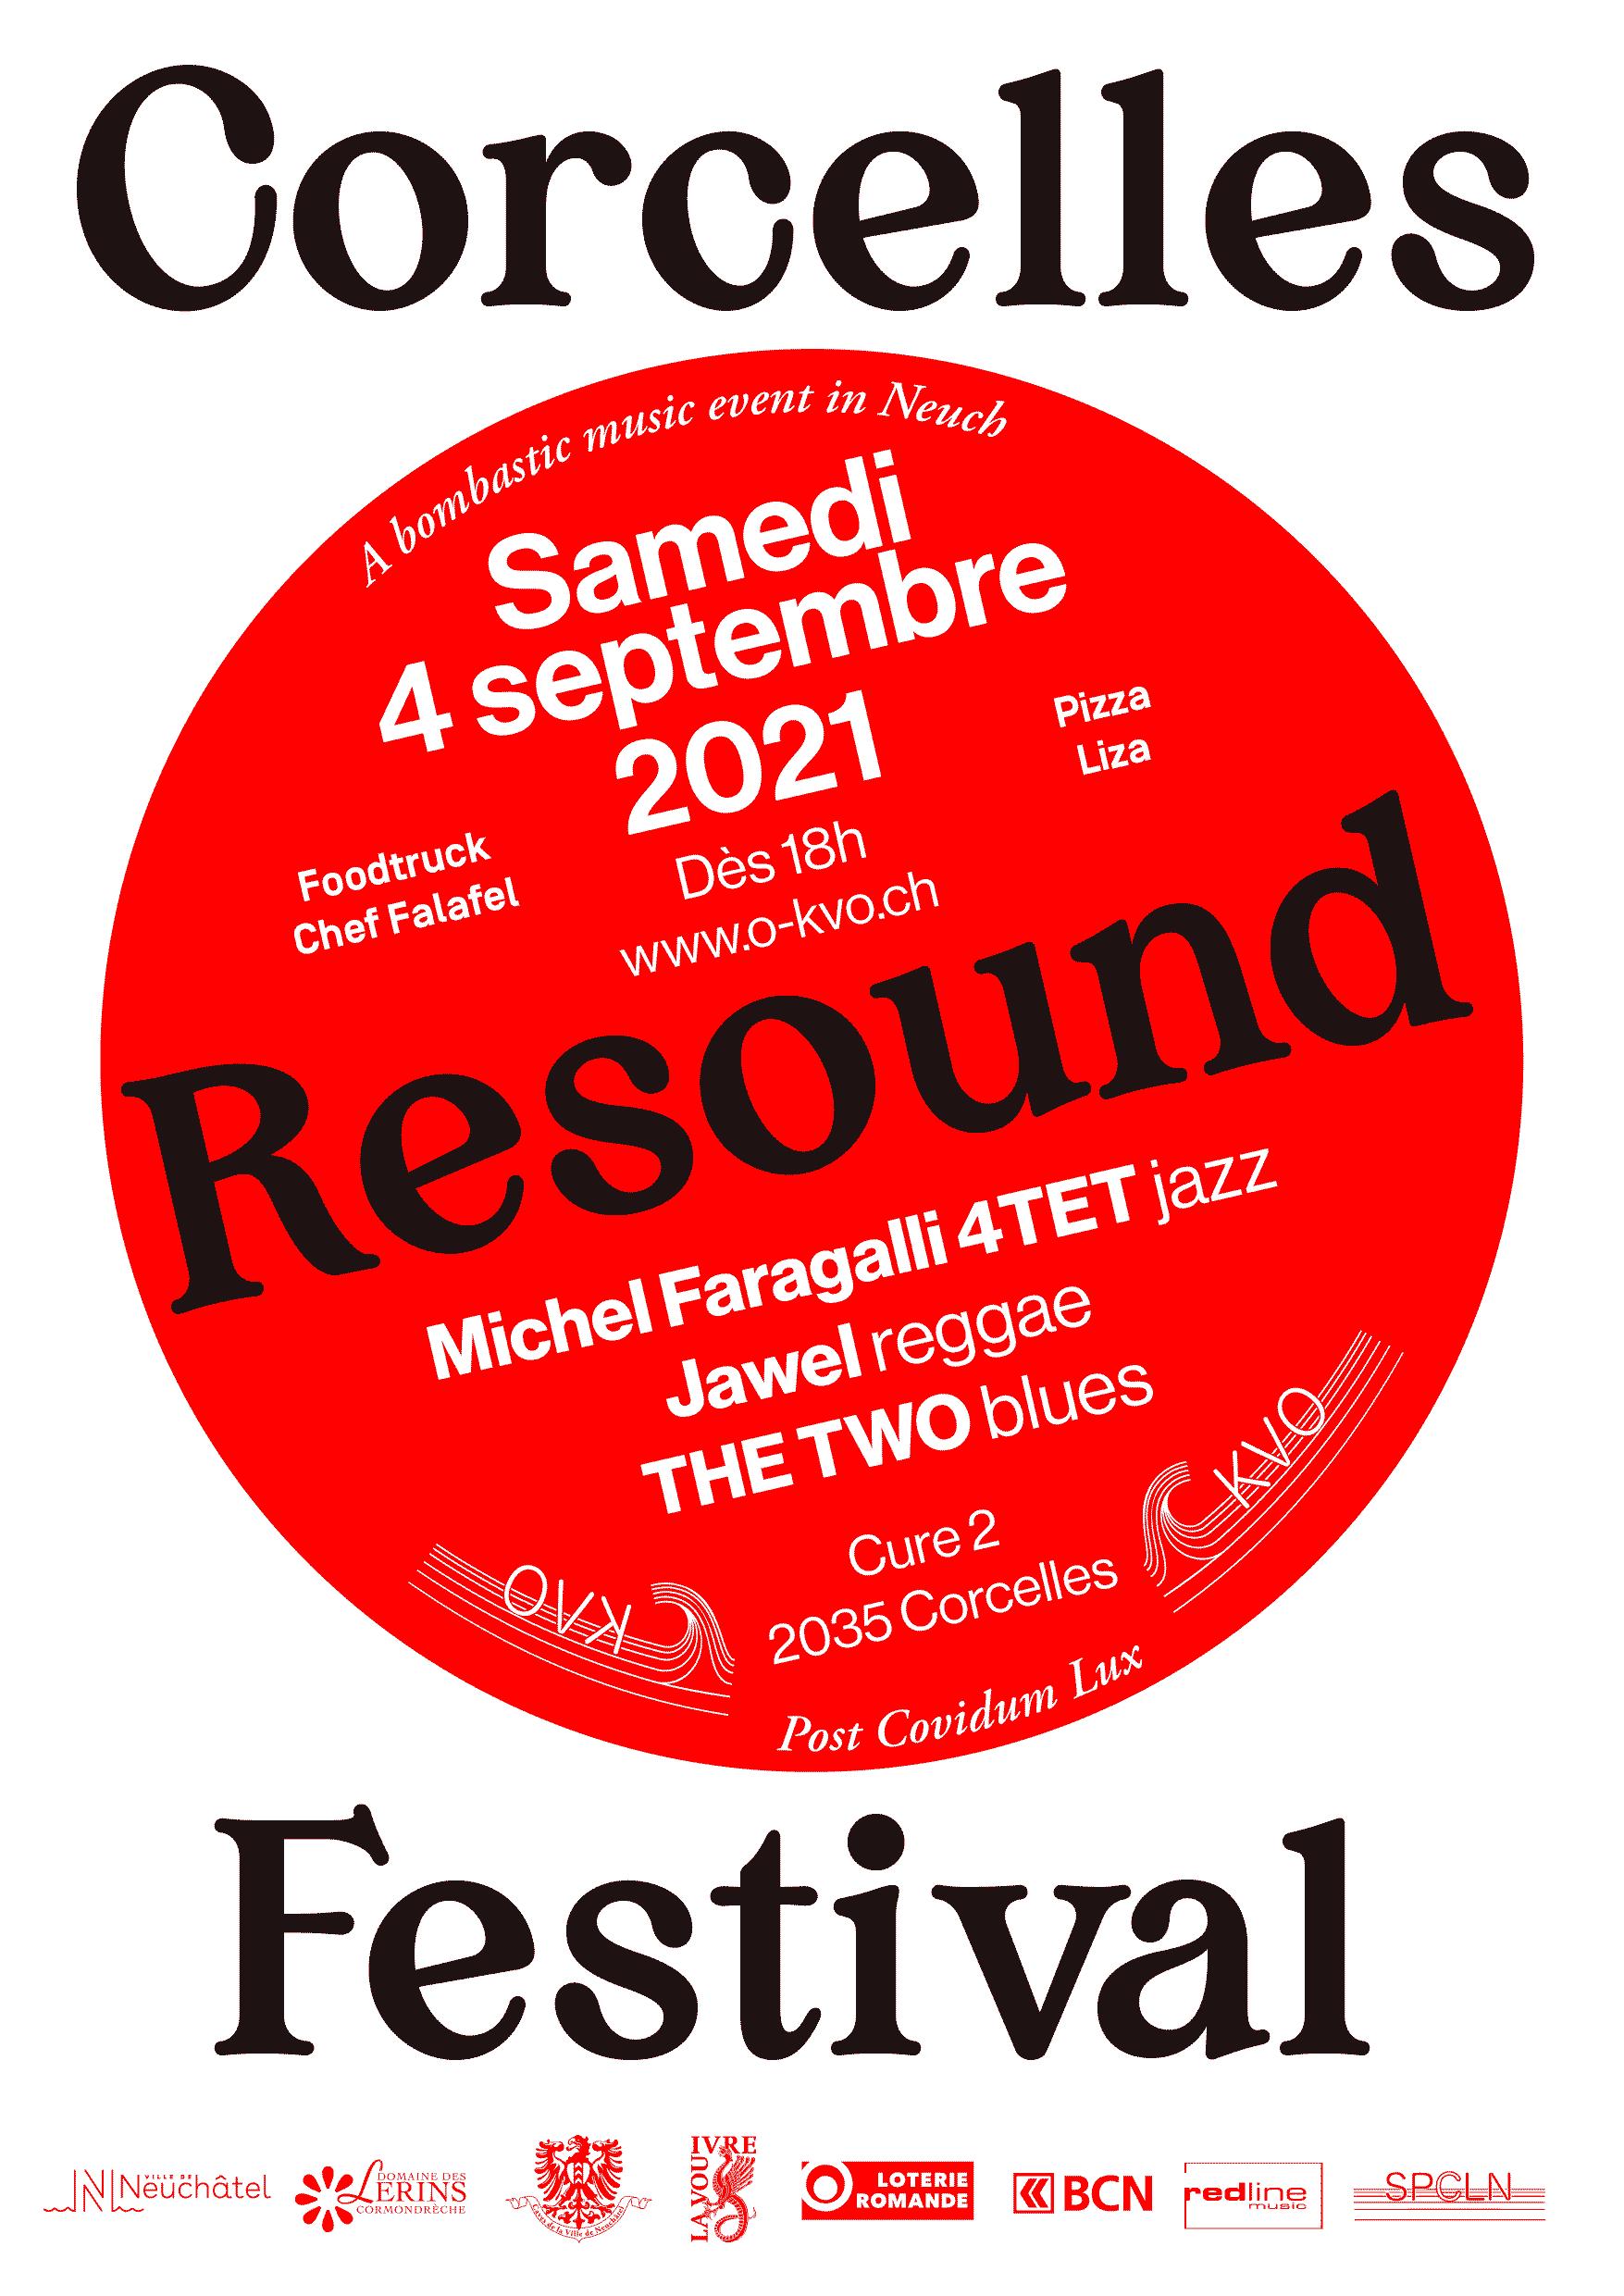 Corcelles Resound Festival